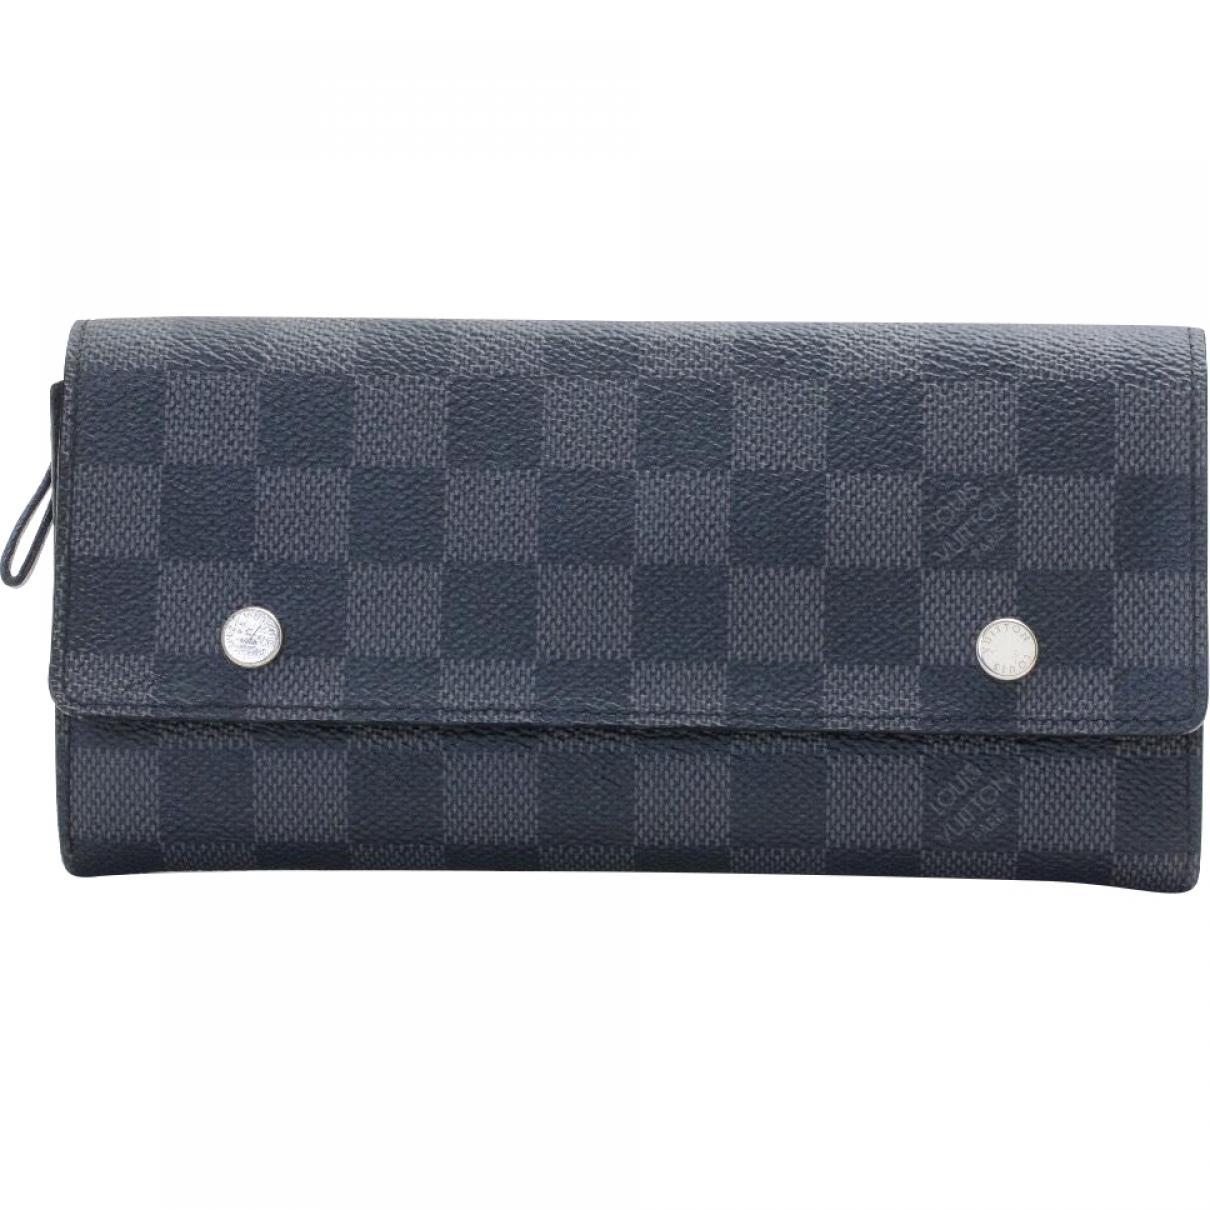 1b9ba7419b77 Louis Vuitton Small Bag in Gray for Men - Lyst